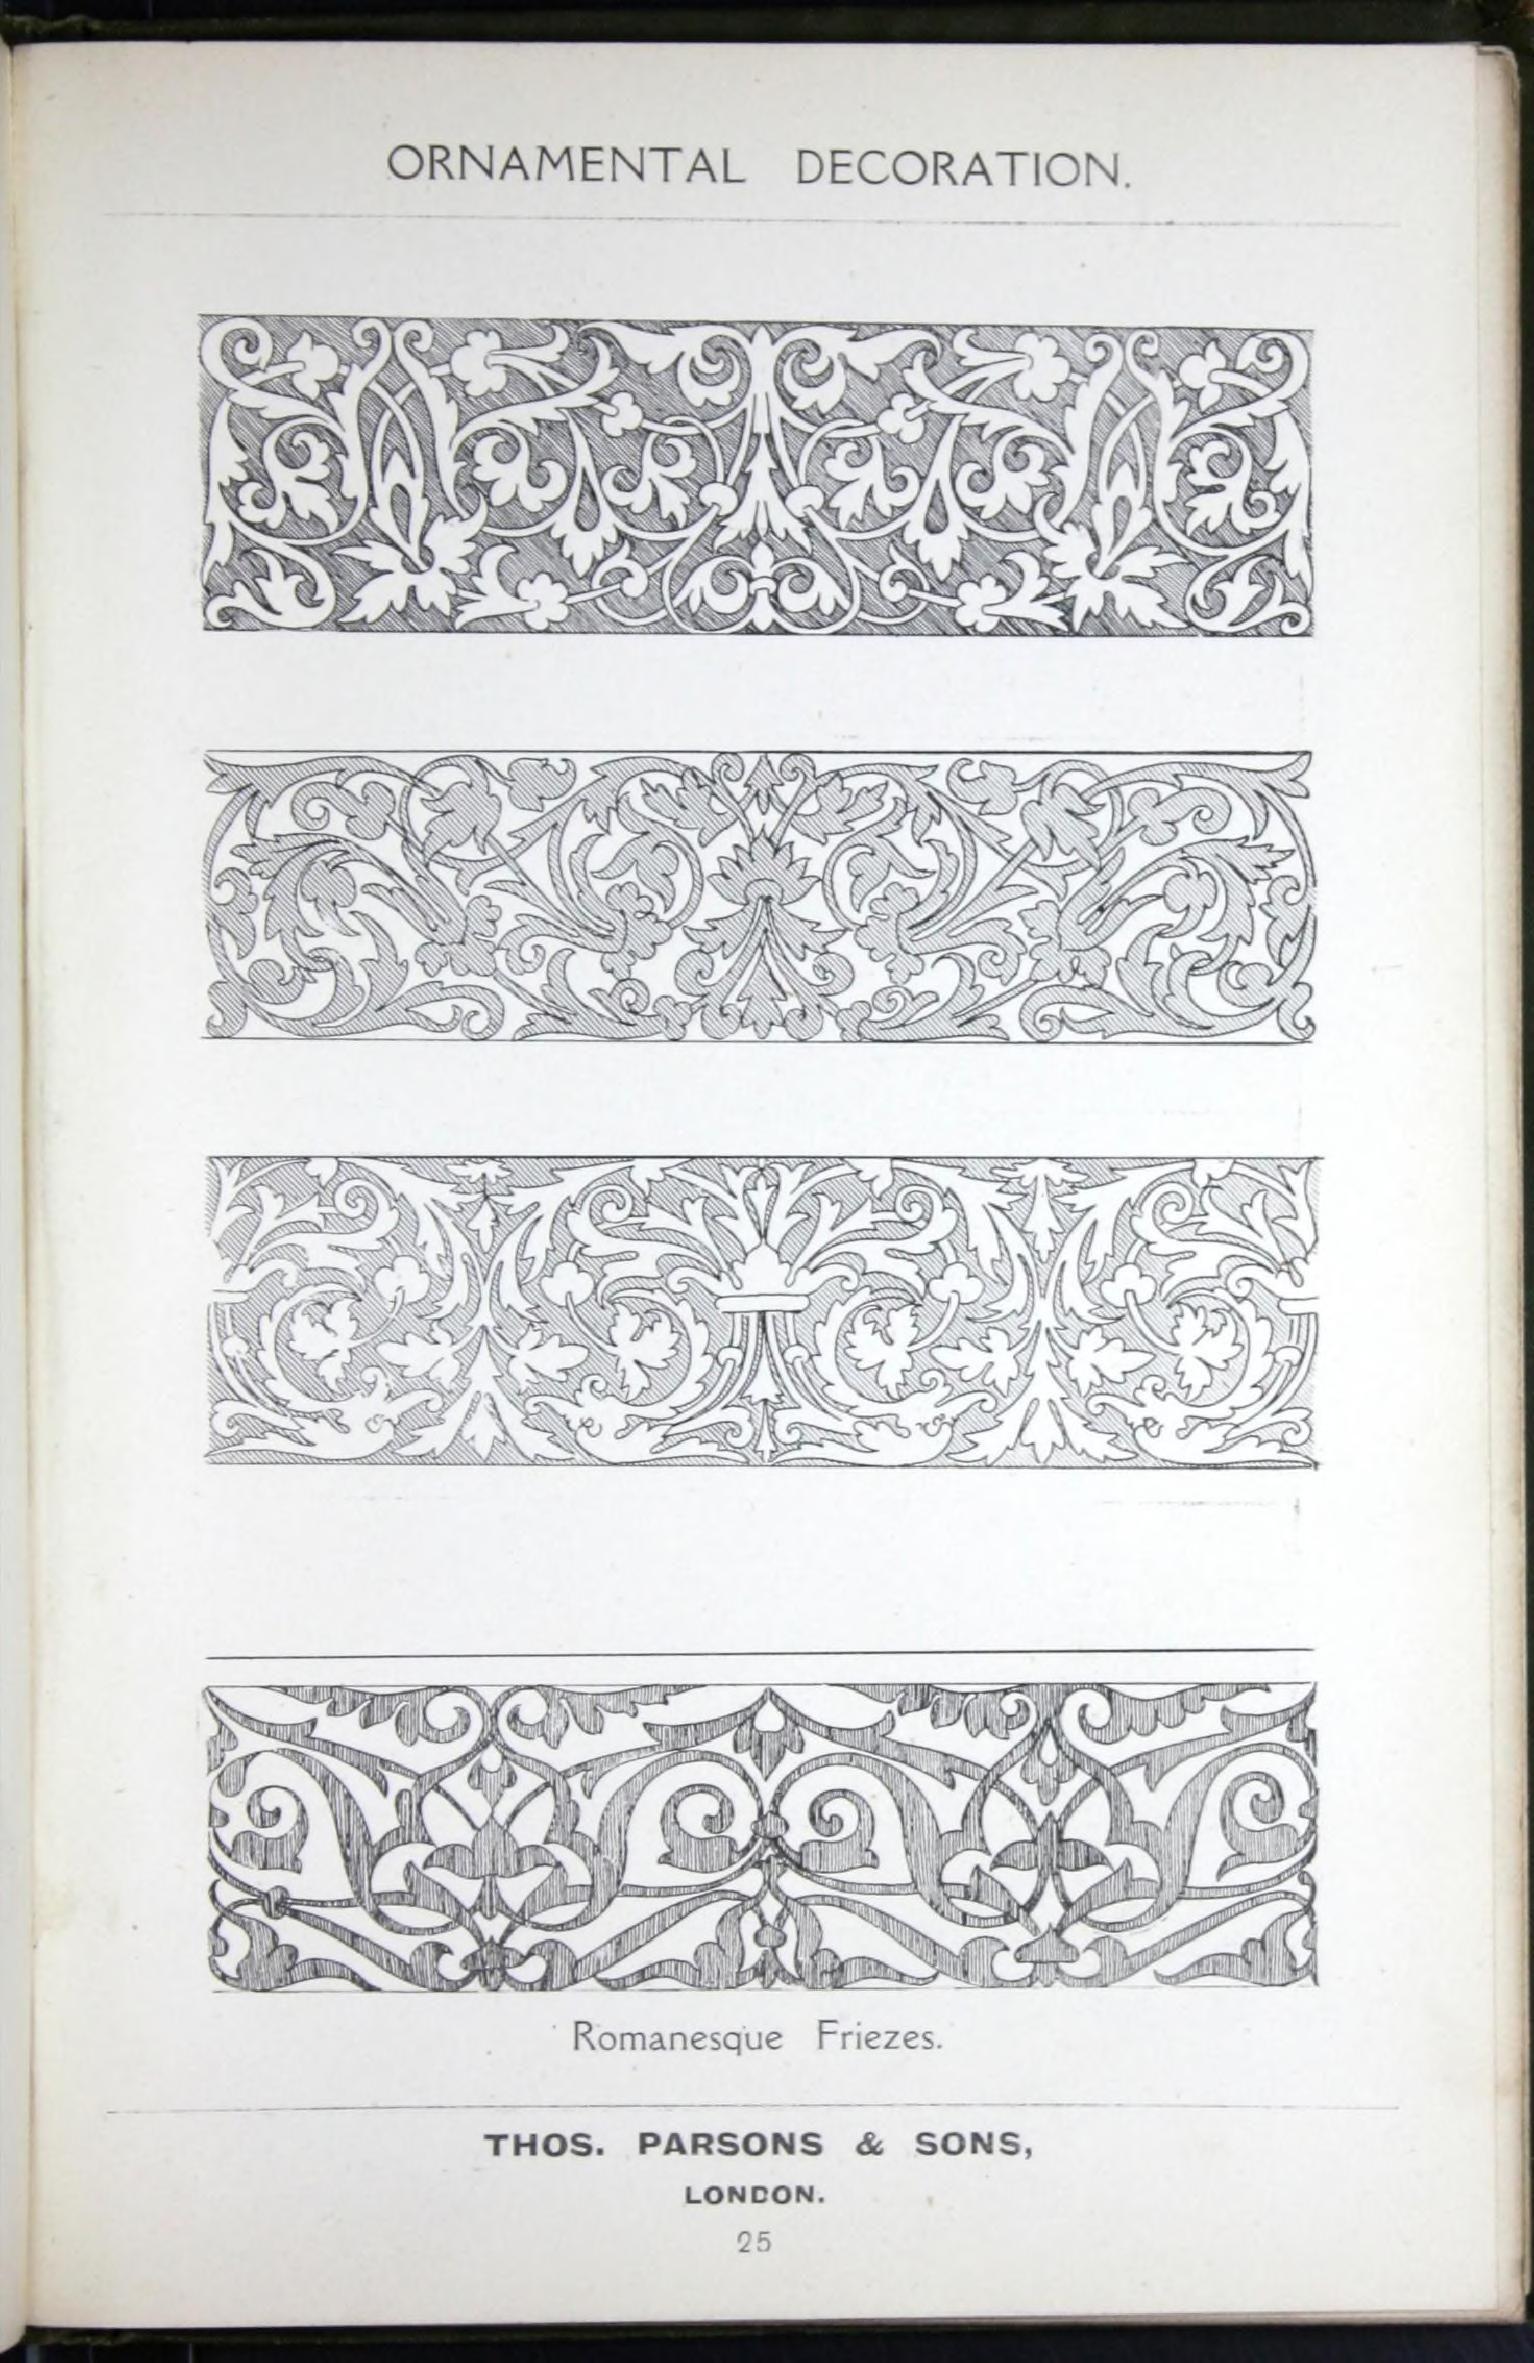 A Few Suggestions For Ornamental Decoration